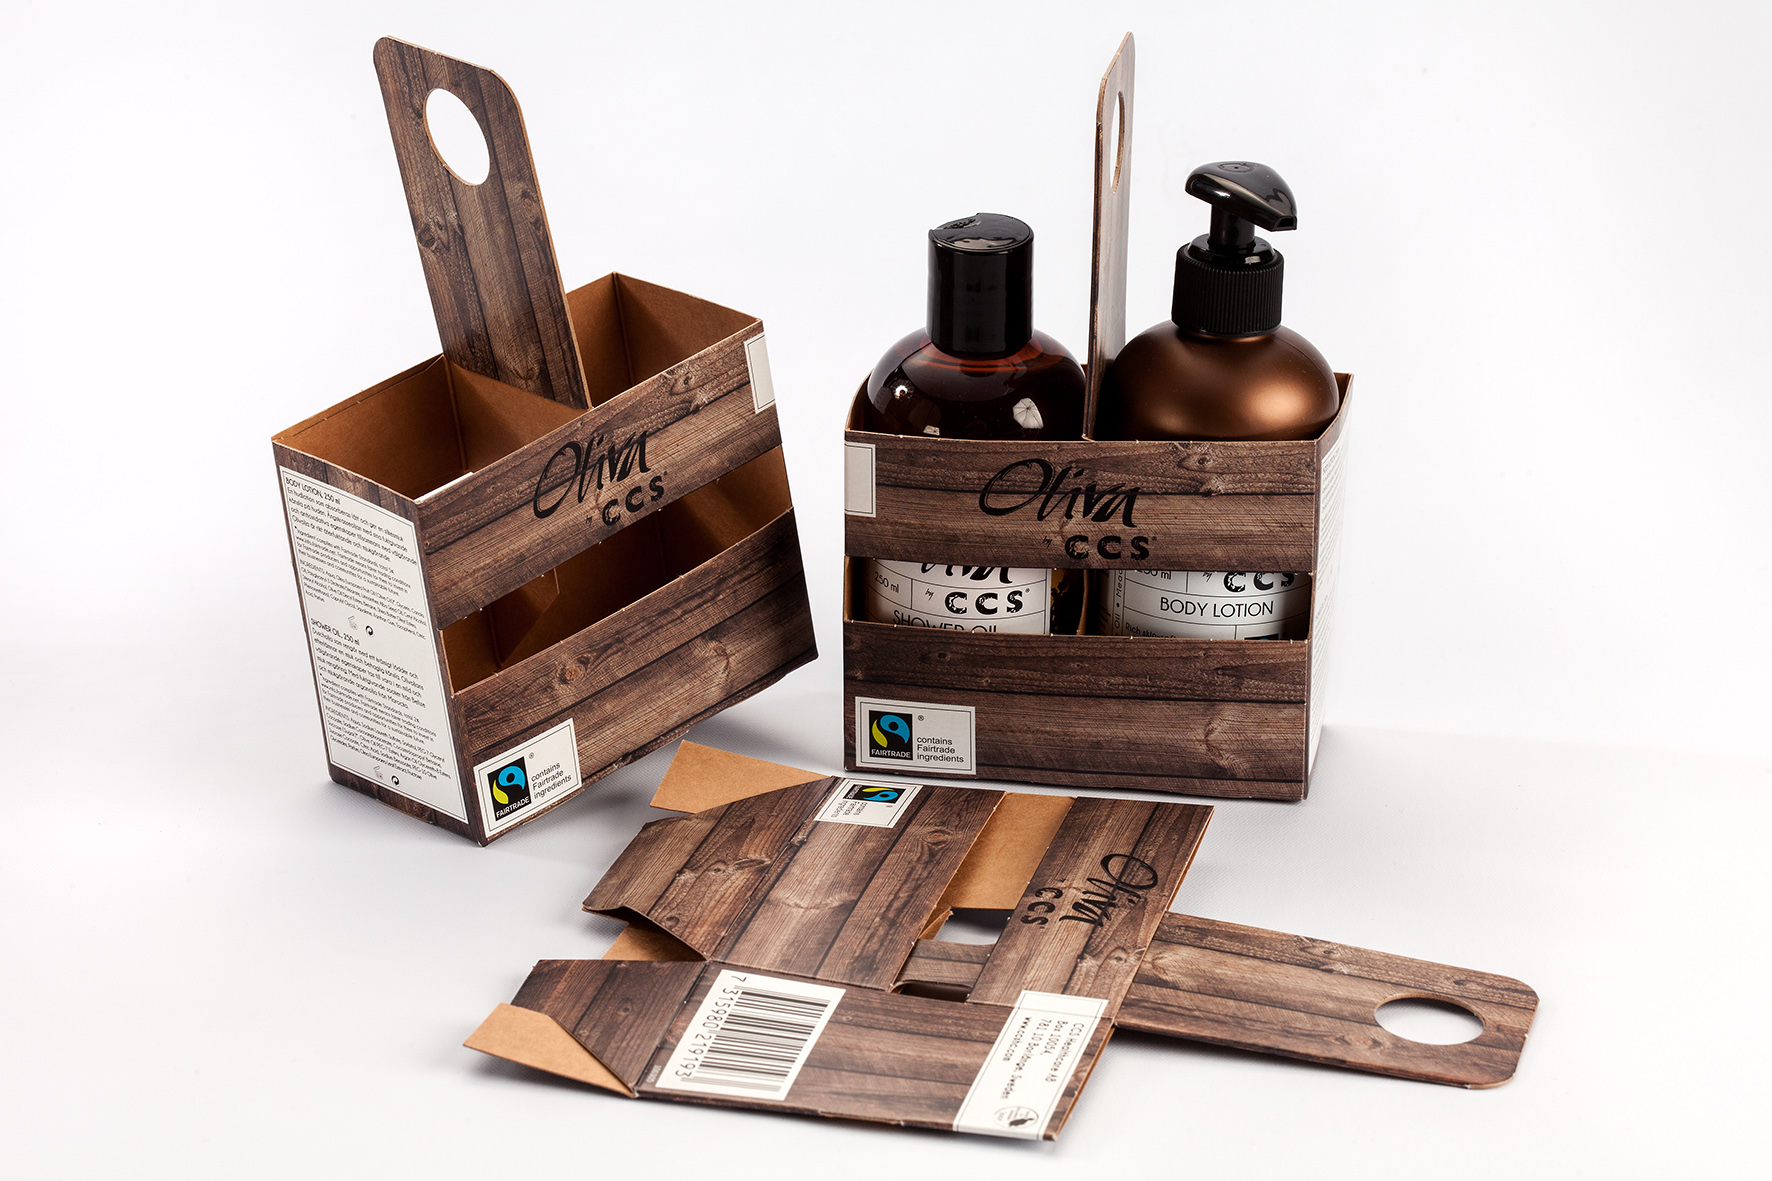 carton-award-image 129445